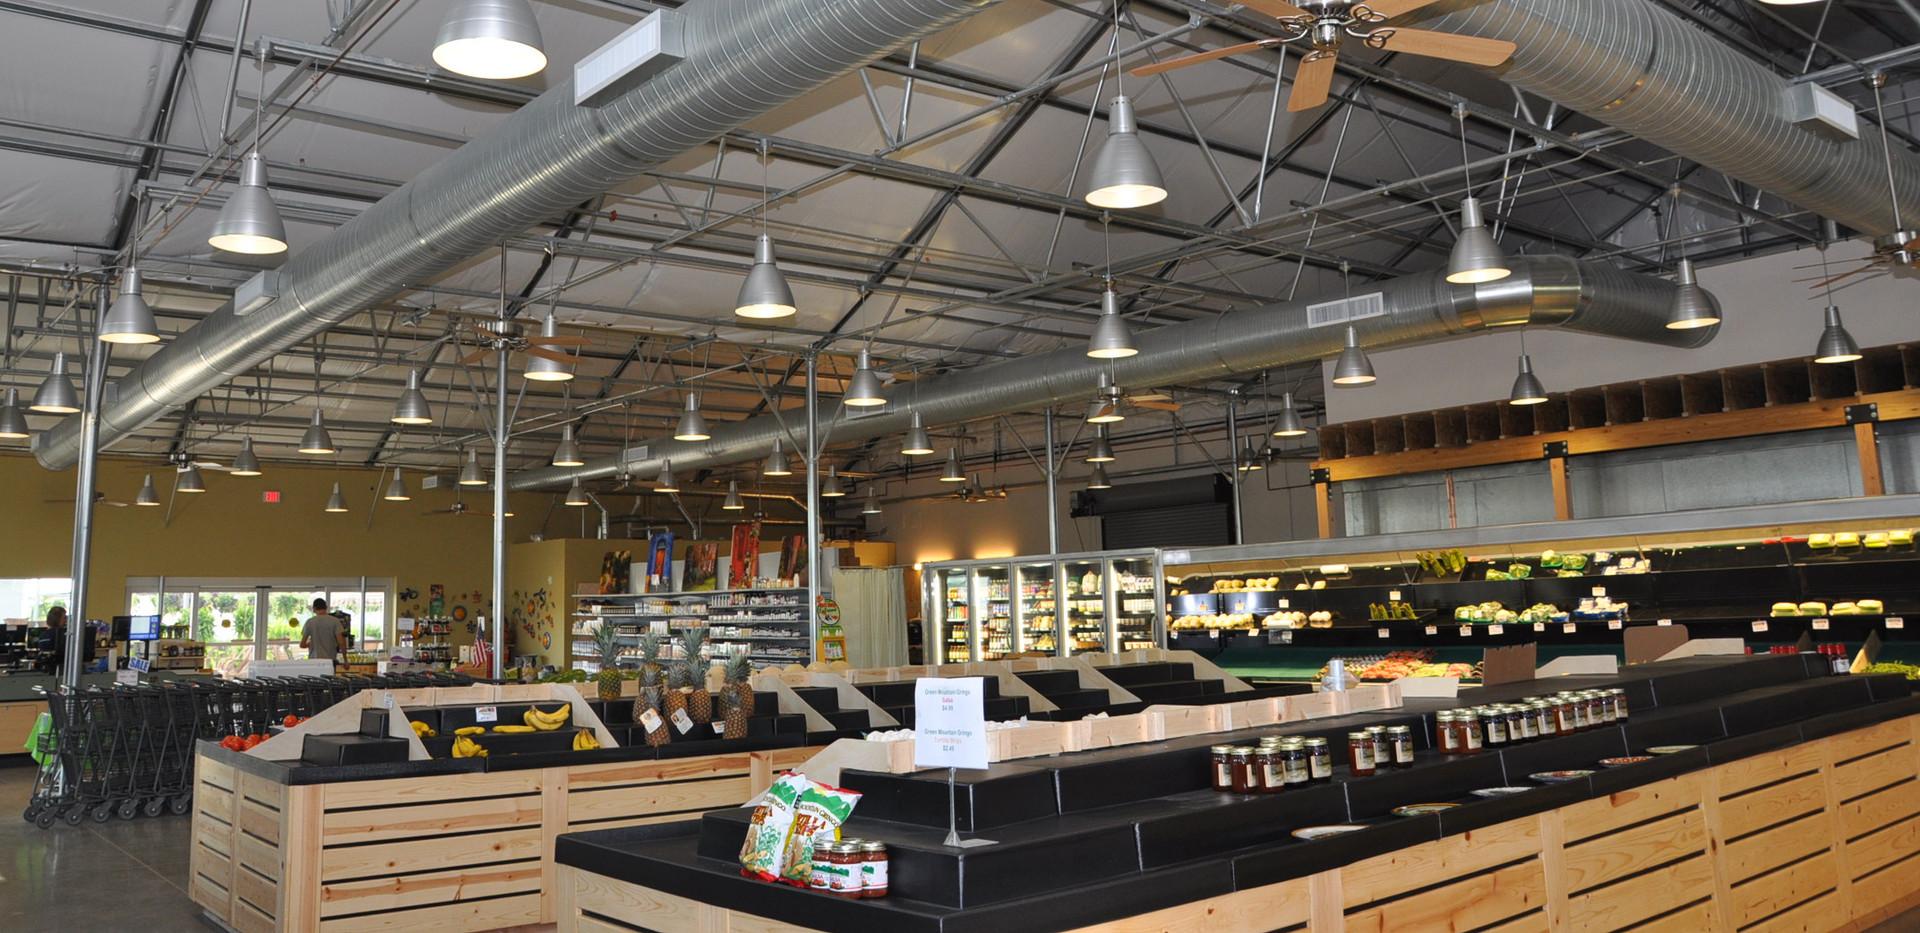 Rosemeade Market & Greenhouse | Frank Dale Construction